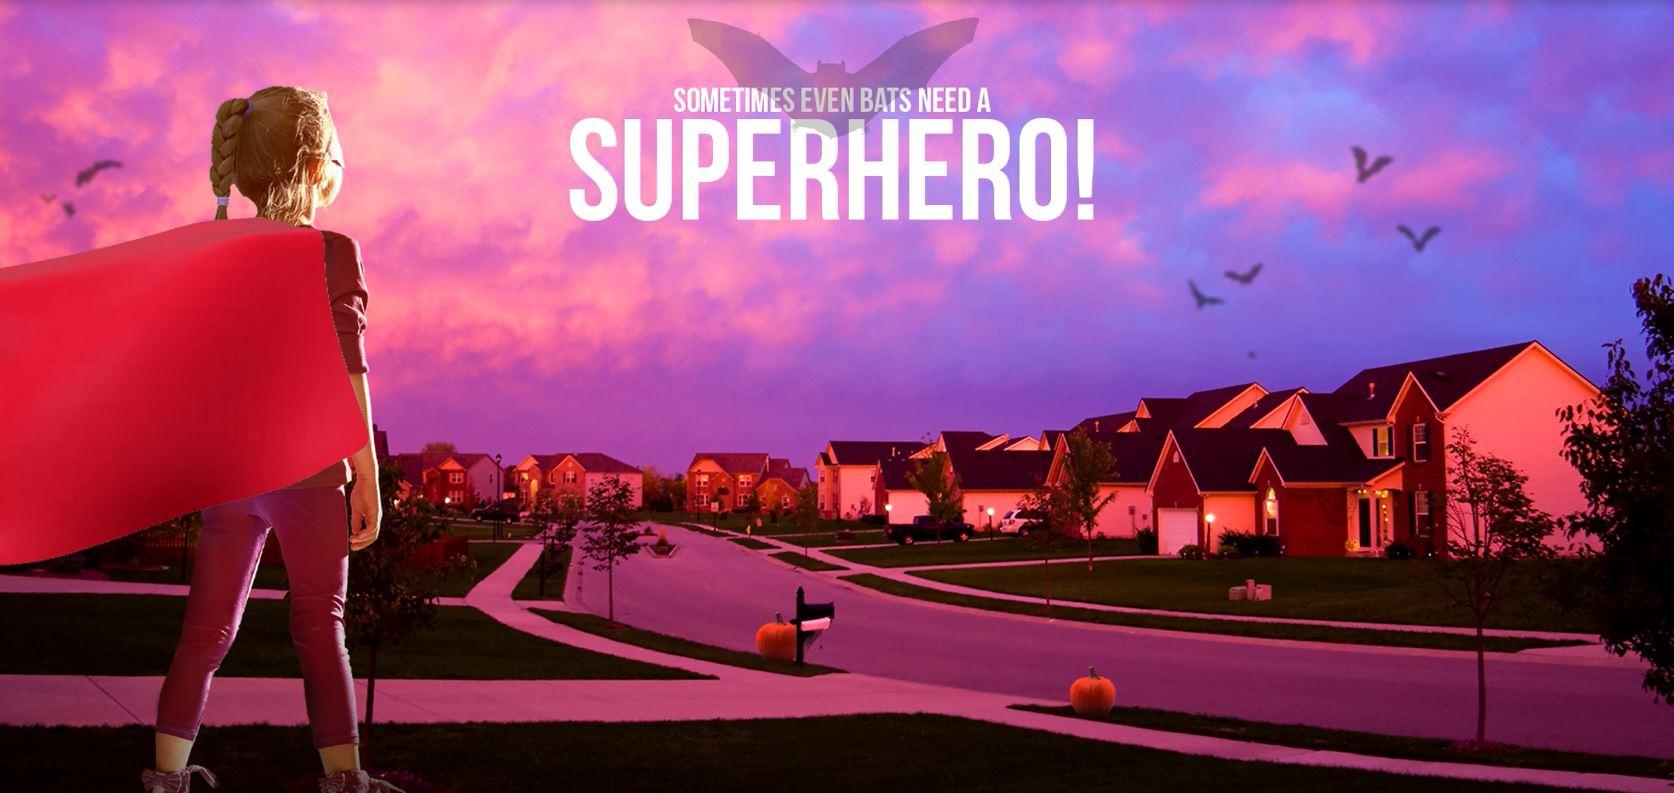 Sometimes Even Bats Need a Superhero